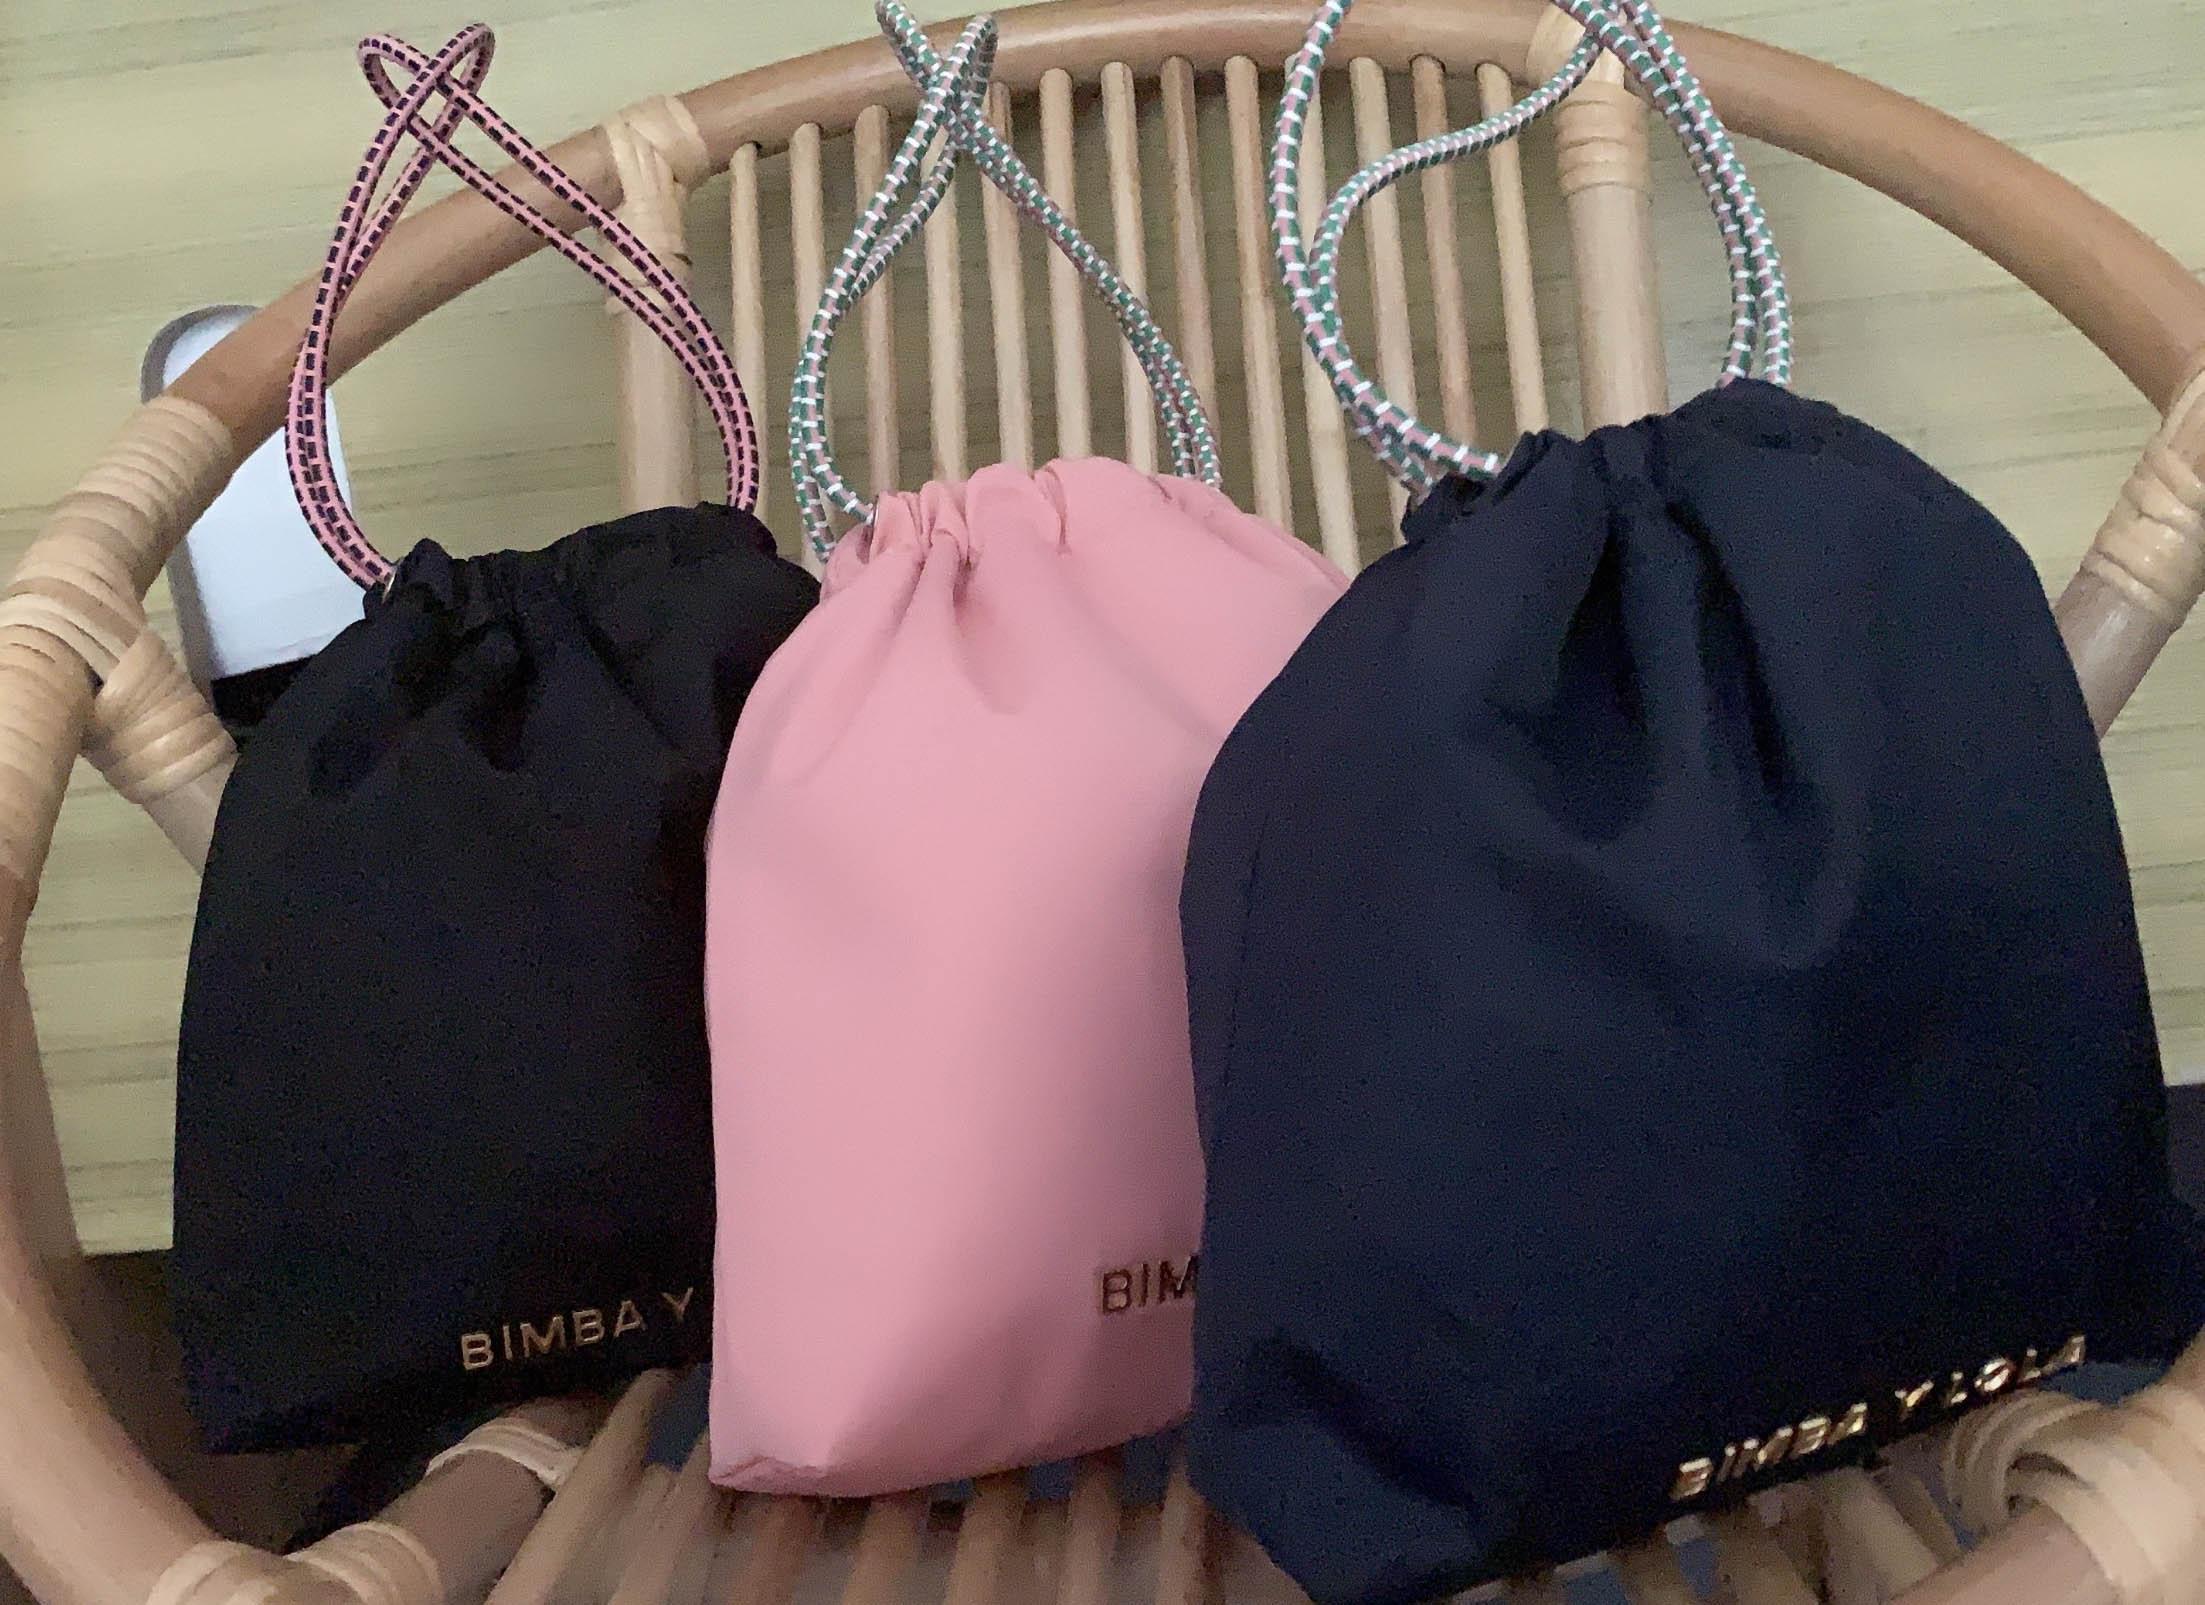 Bolsos Bimba Y Lola Mujer Verano 2020 Marca String Satch Bag Lady Wristlet Bag 23*21*5cm